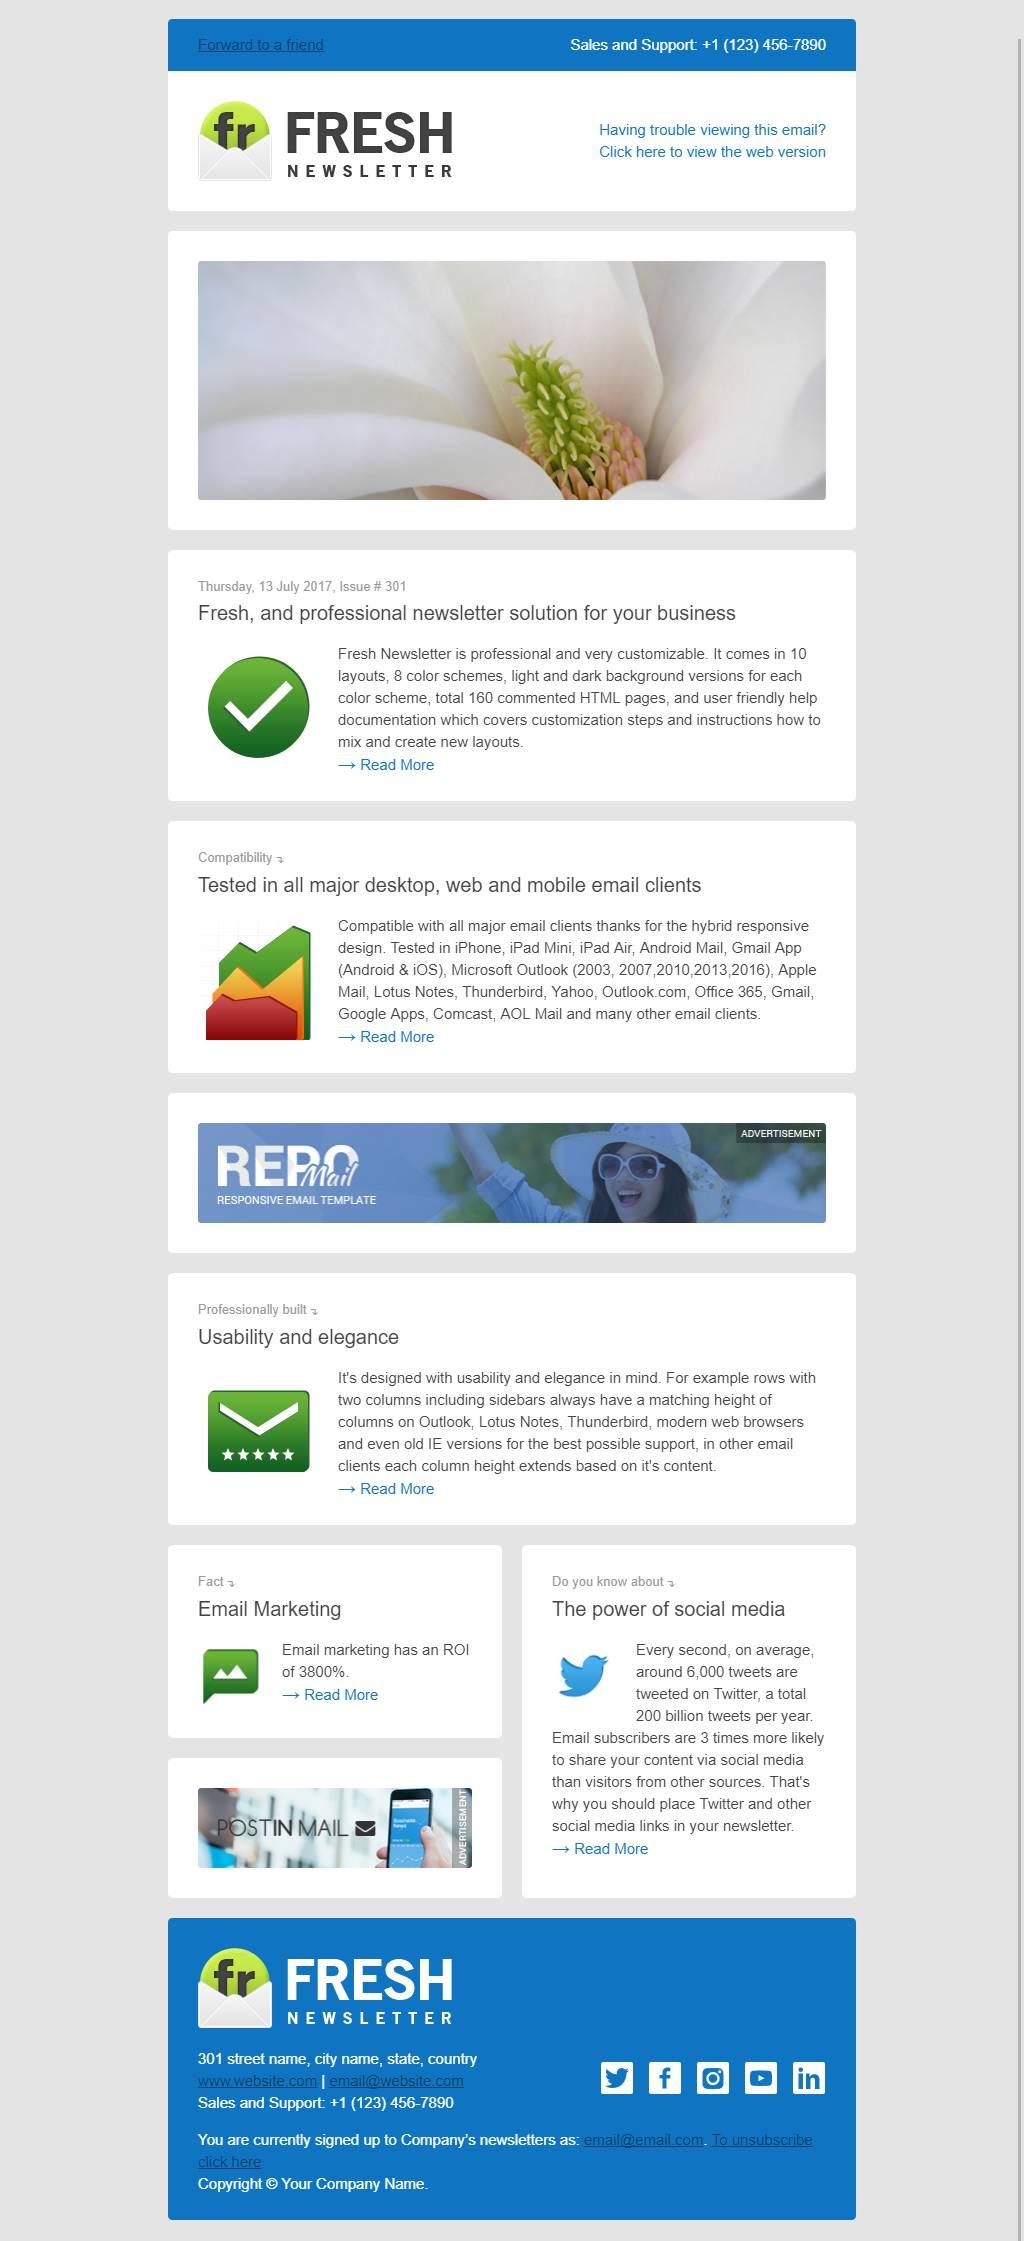 Office 365 Sharepoint Website Templates